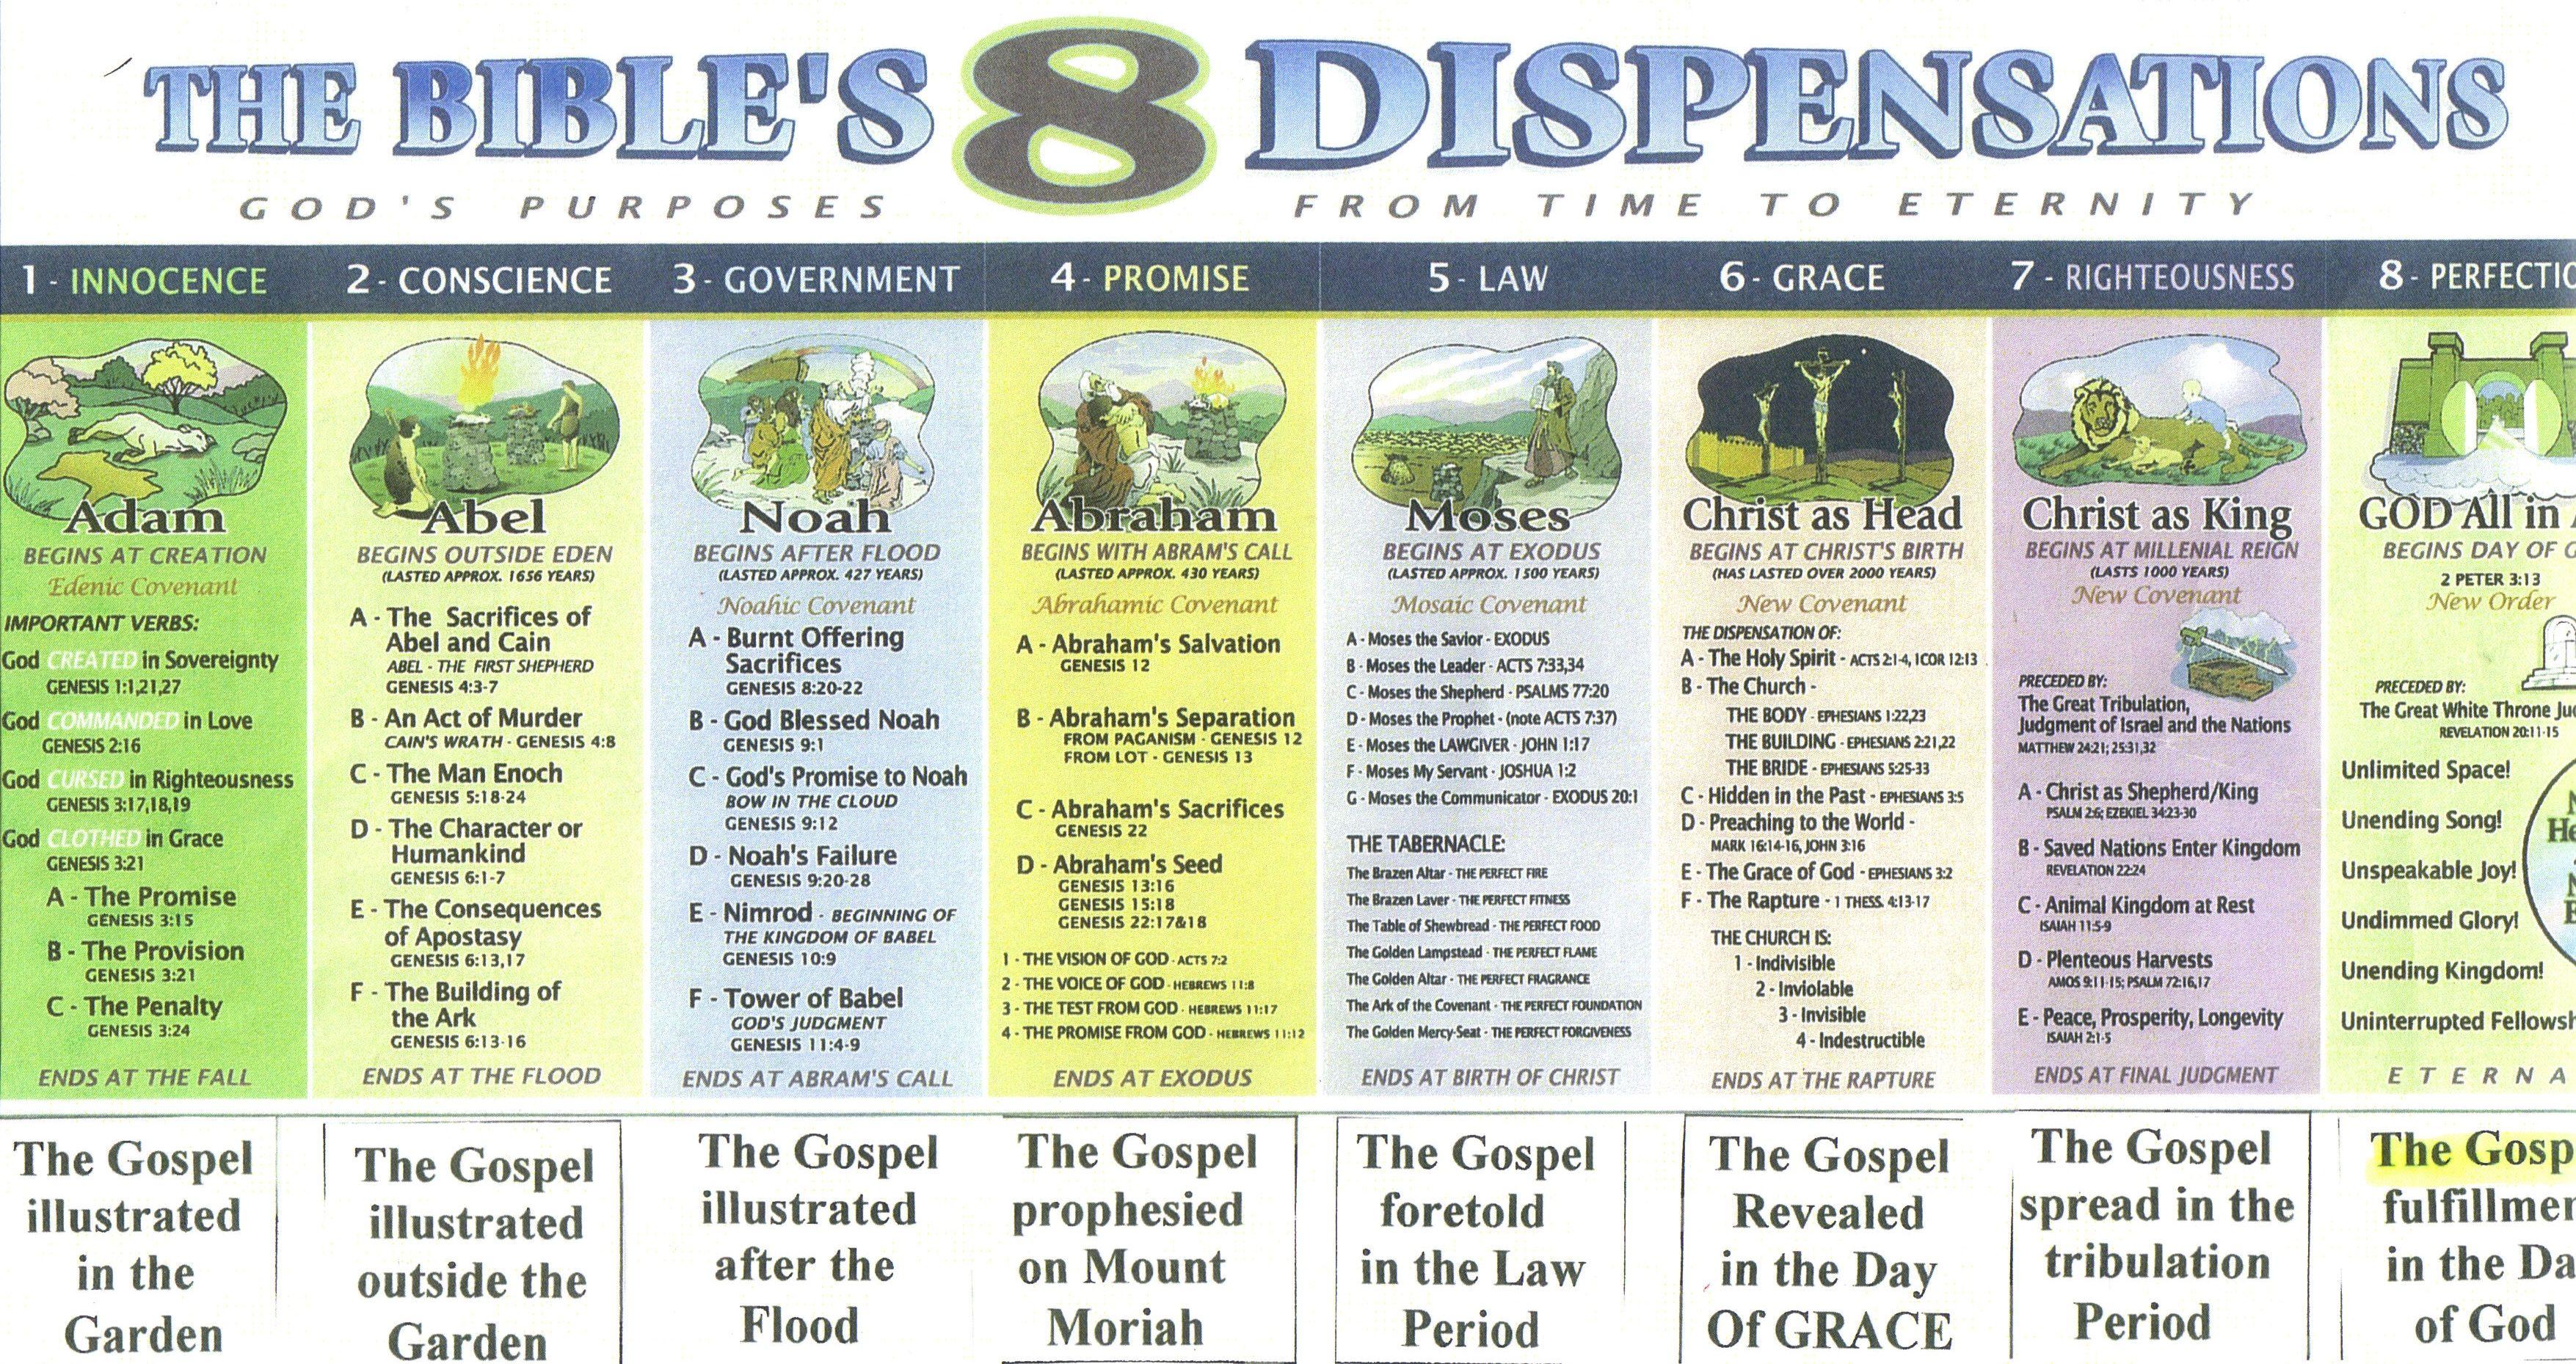 Albert Hull Dispensations Chart